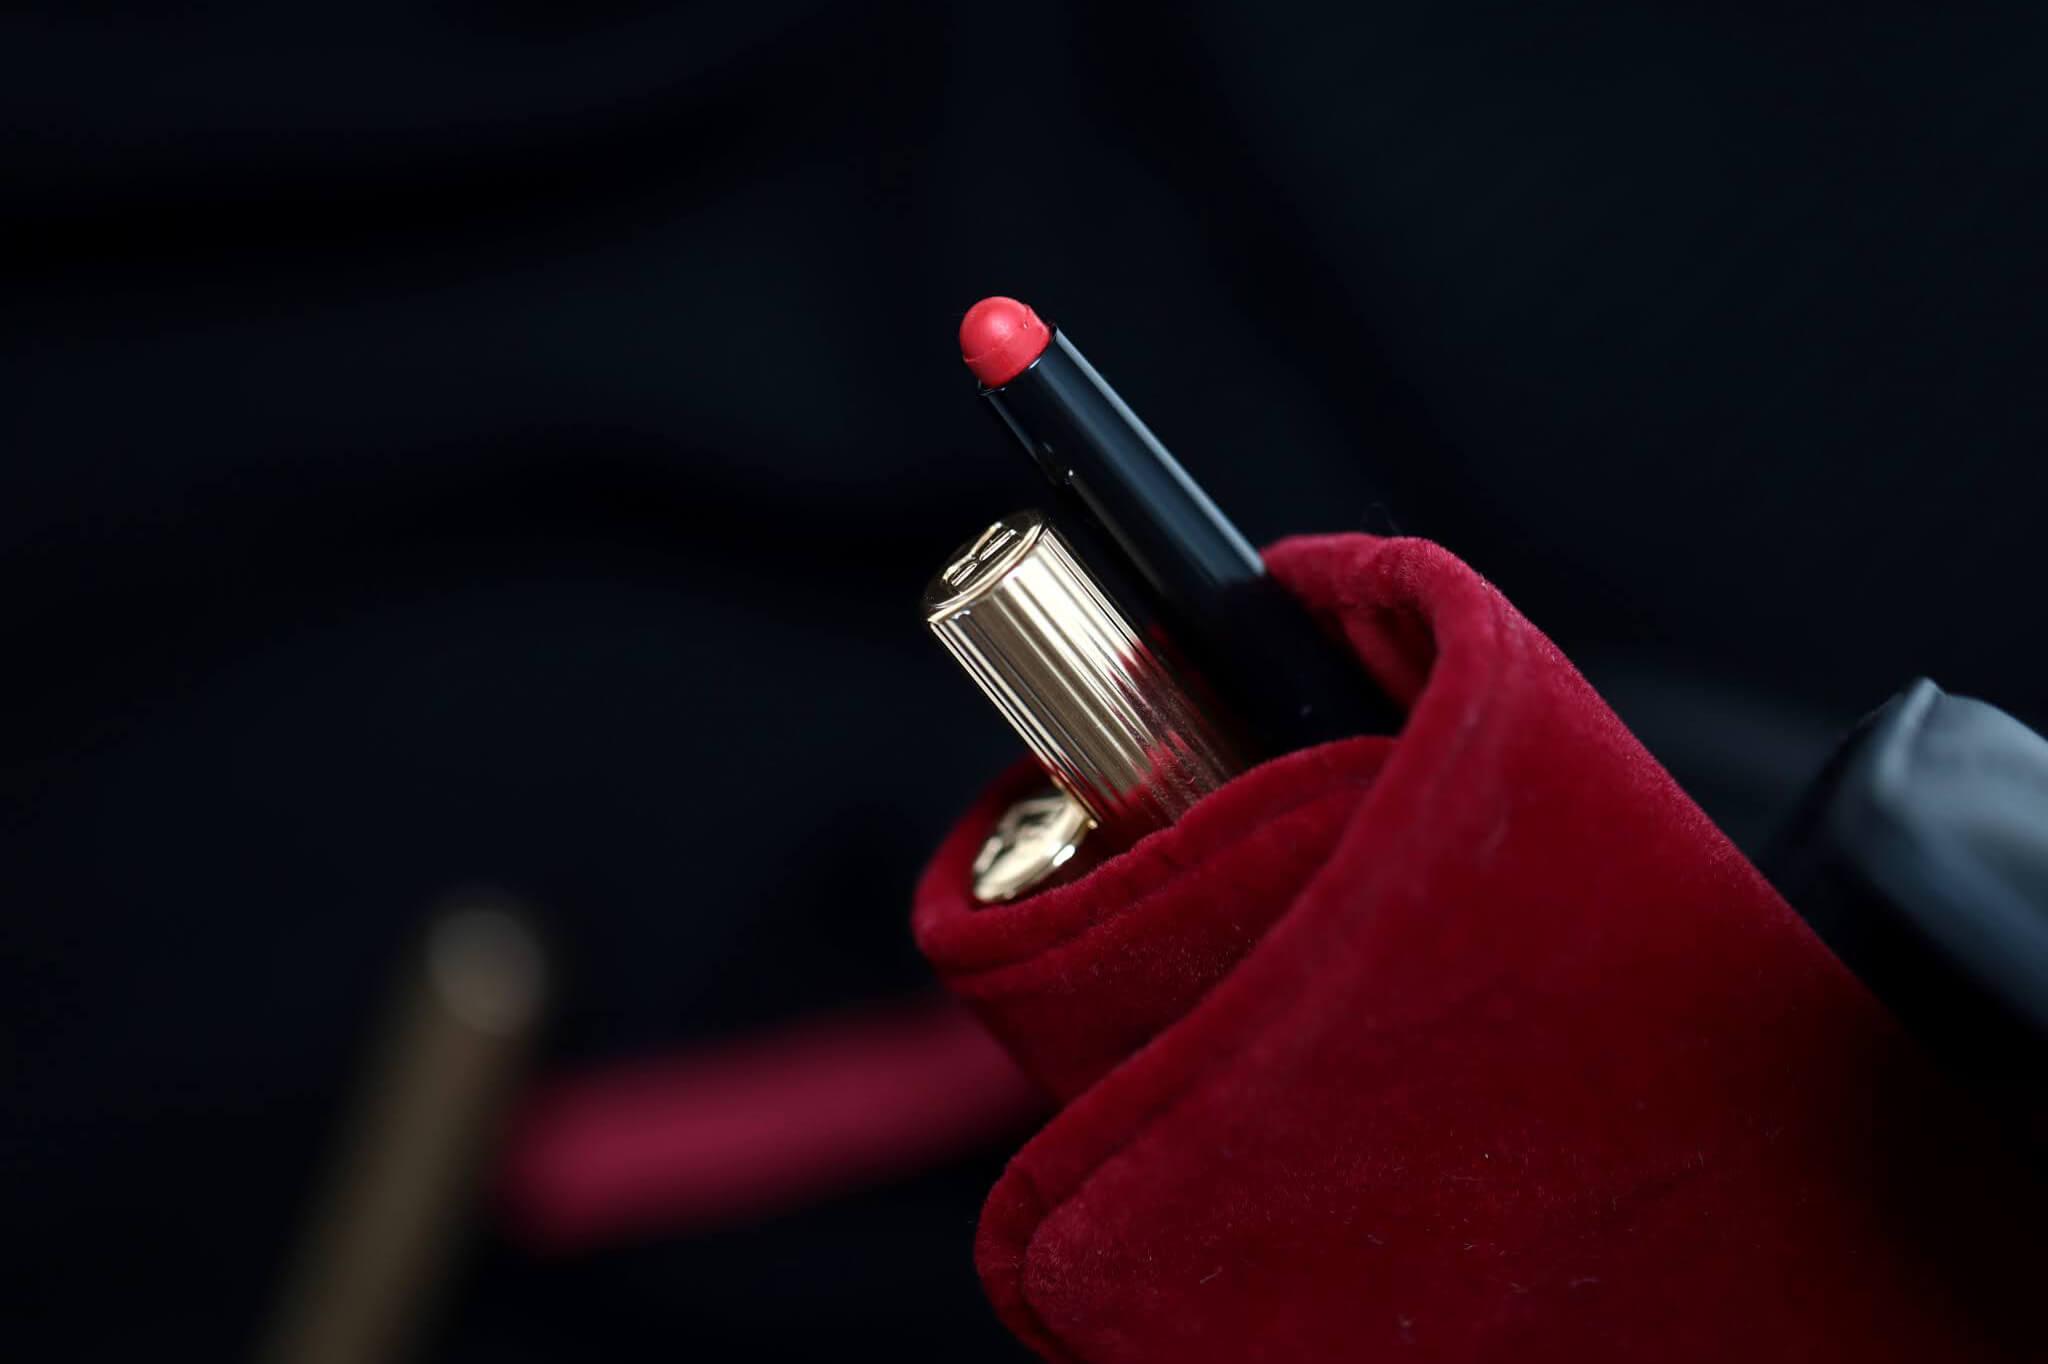 Rouje Le Stylo rouge à lèvres Helene Margaux Emilie Louise